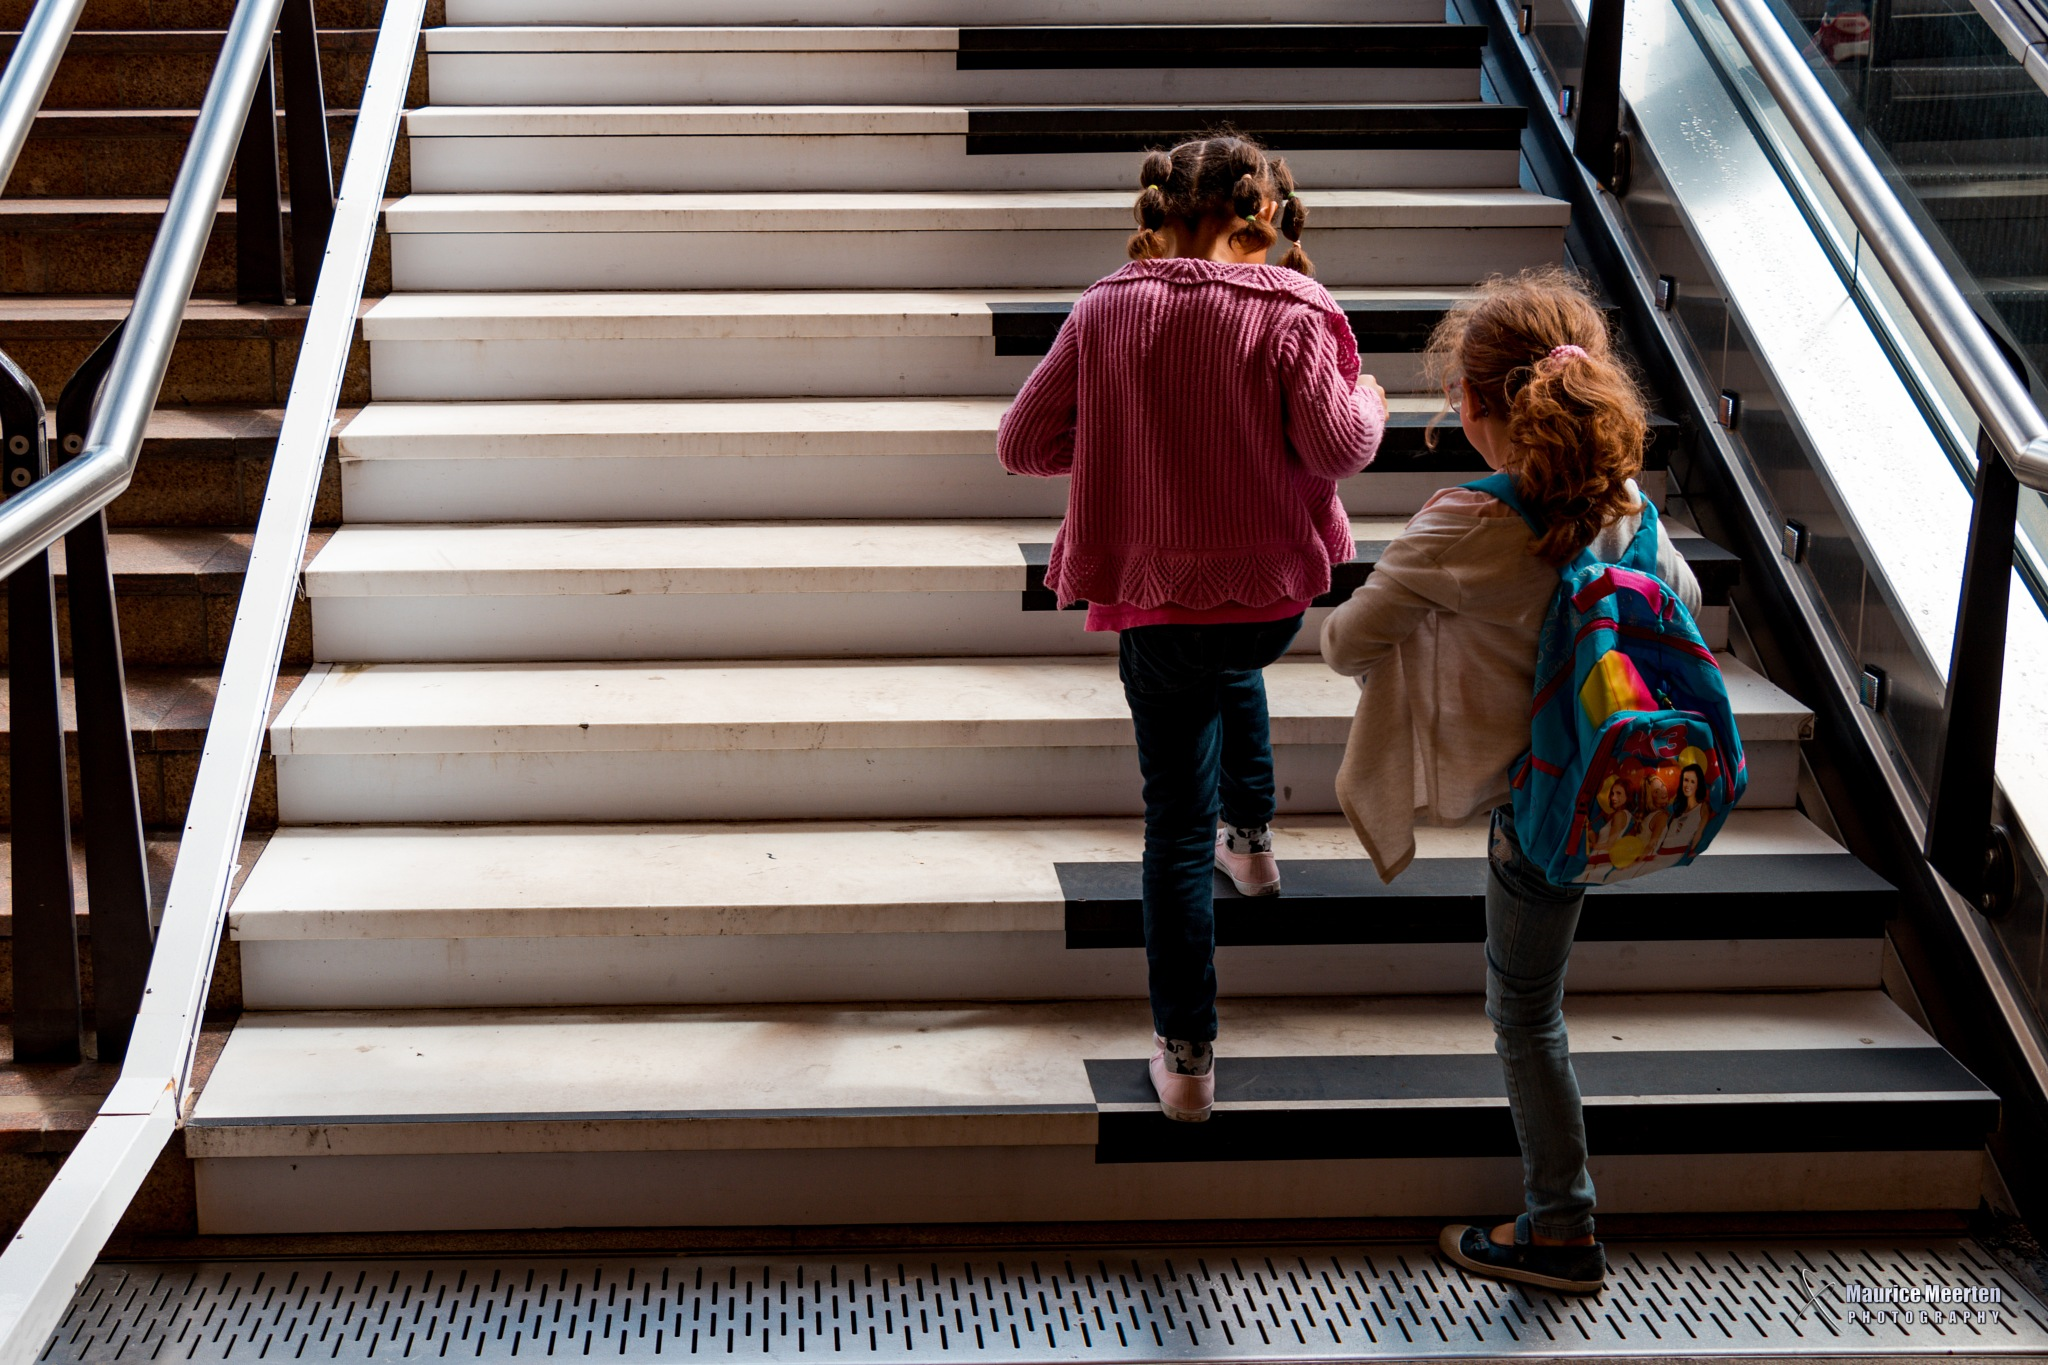 Piano stairs by Maurice Meerten